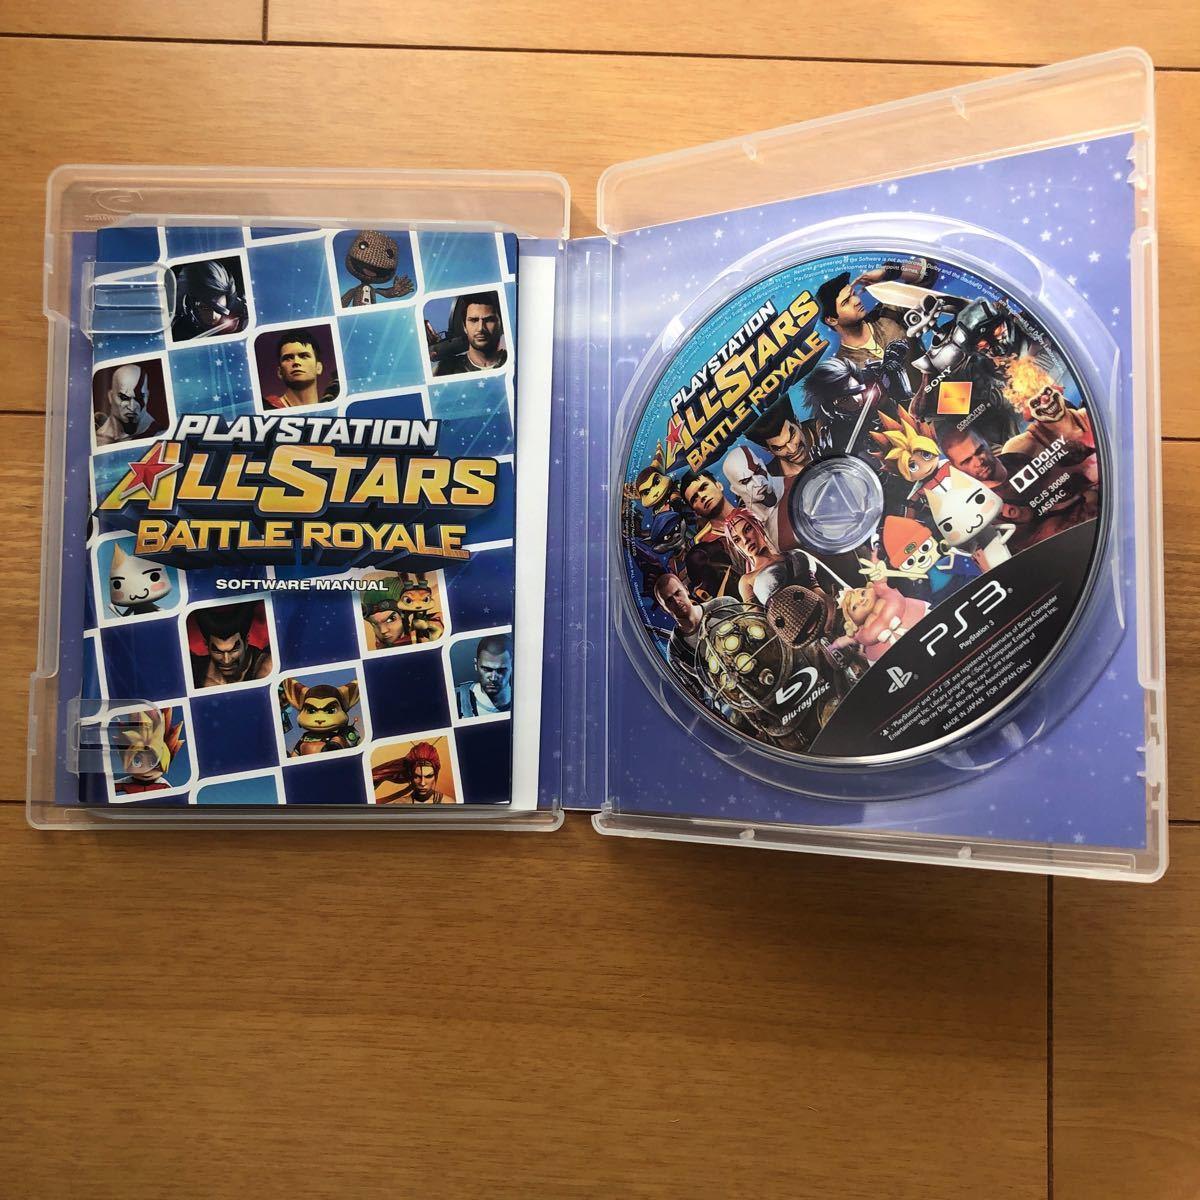 【PS3】 プレイステーション オールスター・バトルロイヤル